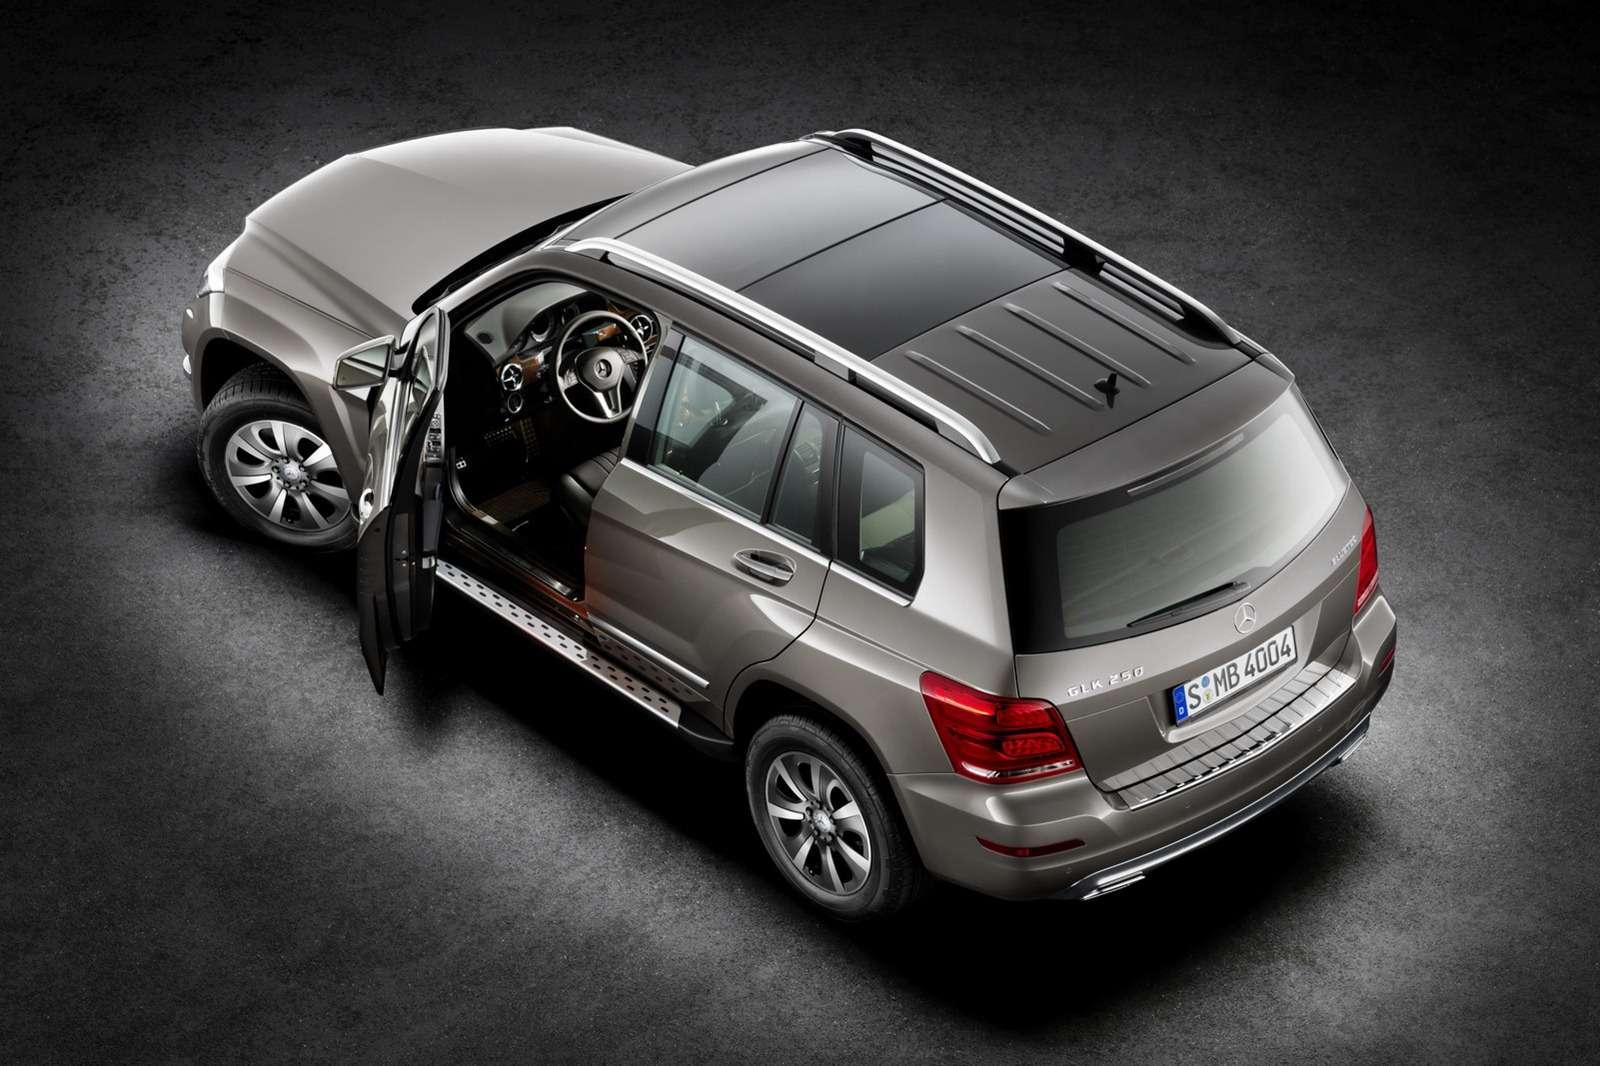 Mercedes-Benz GLK 2013 Facelift